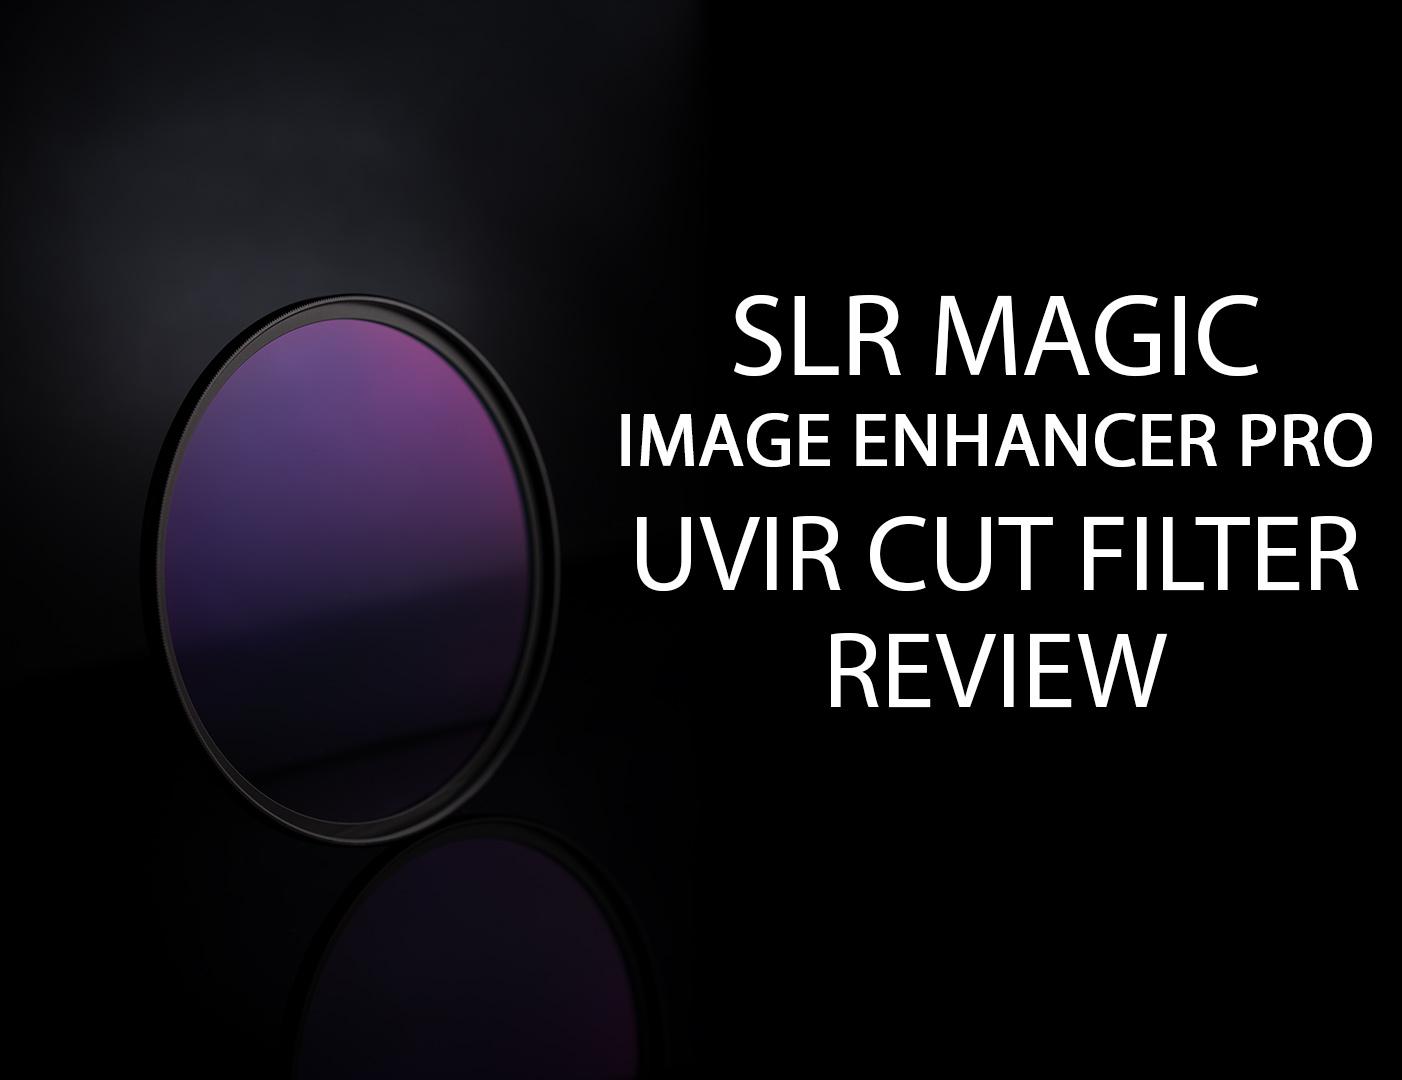 SLR Magic Image Enhancer Pro UVIR cut filter review